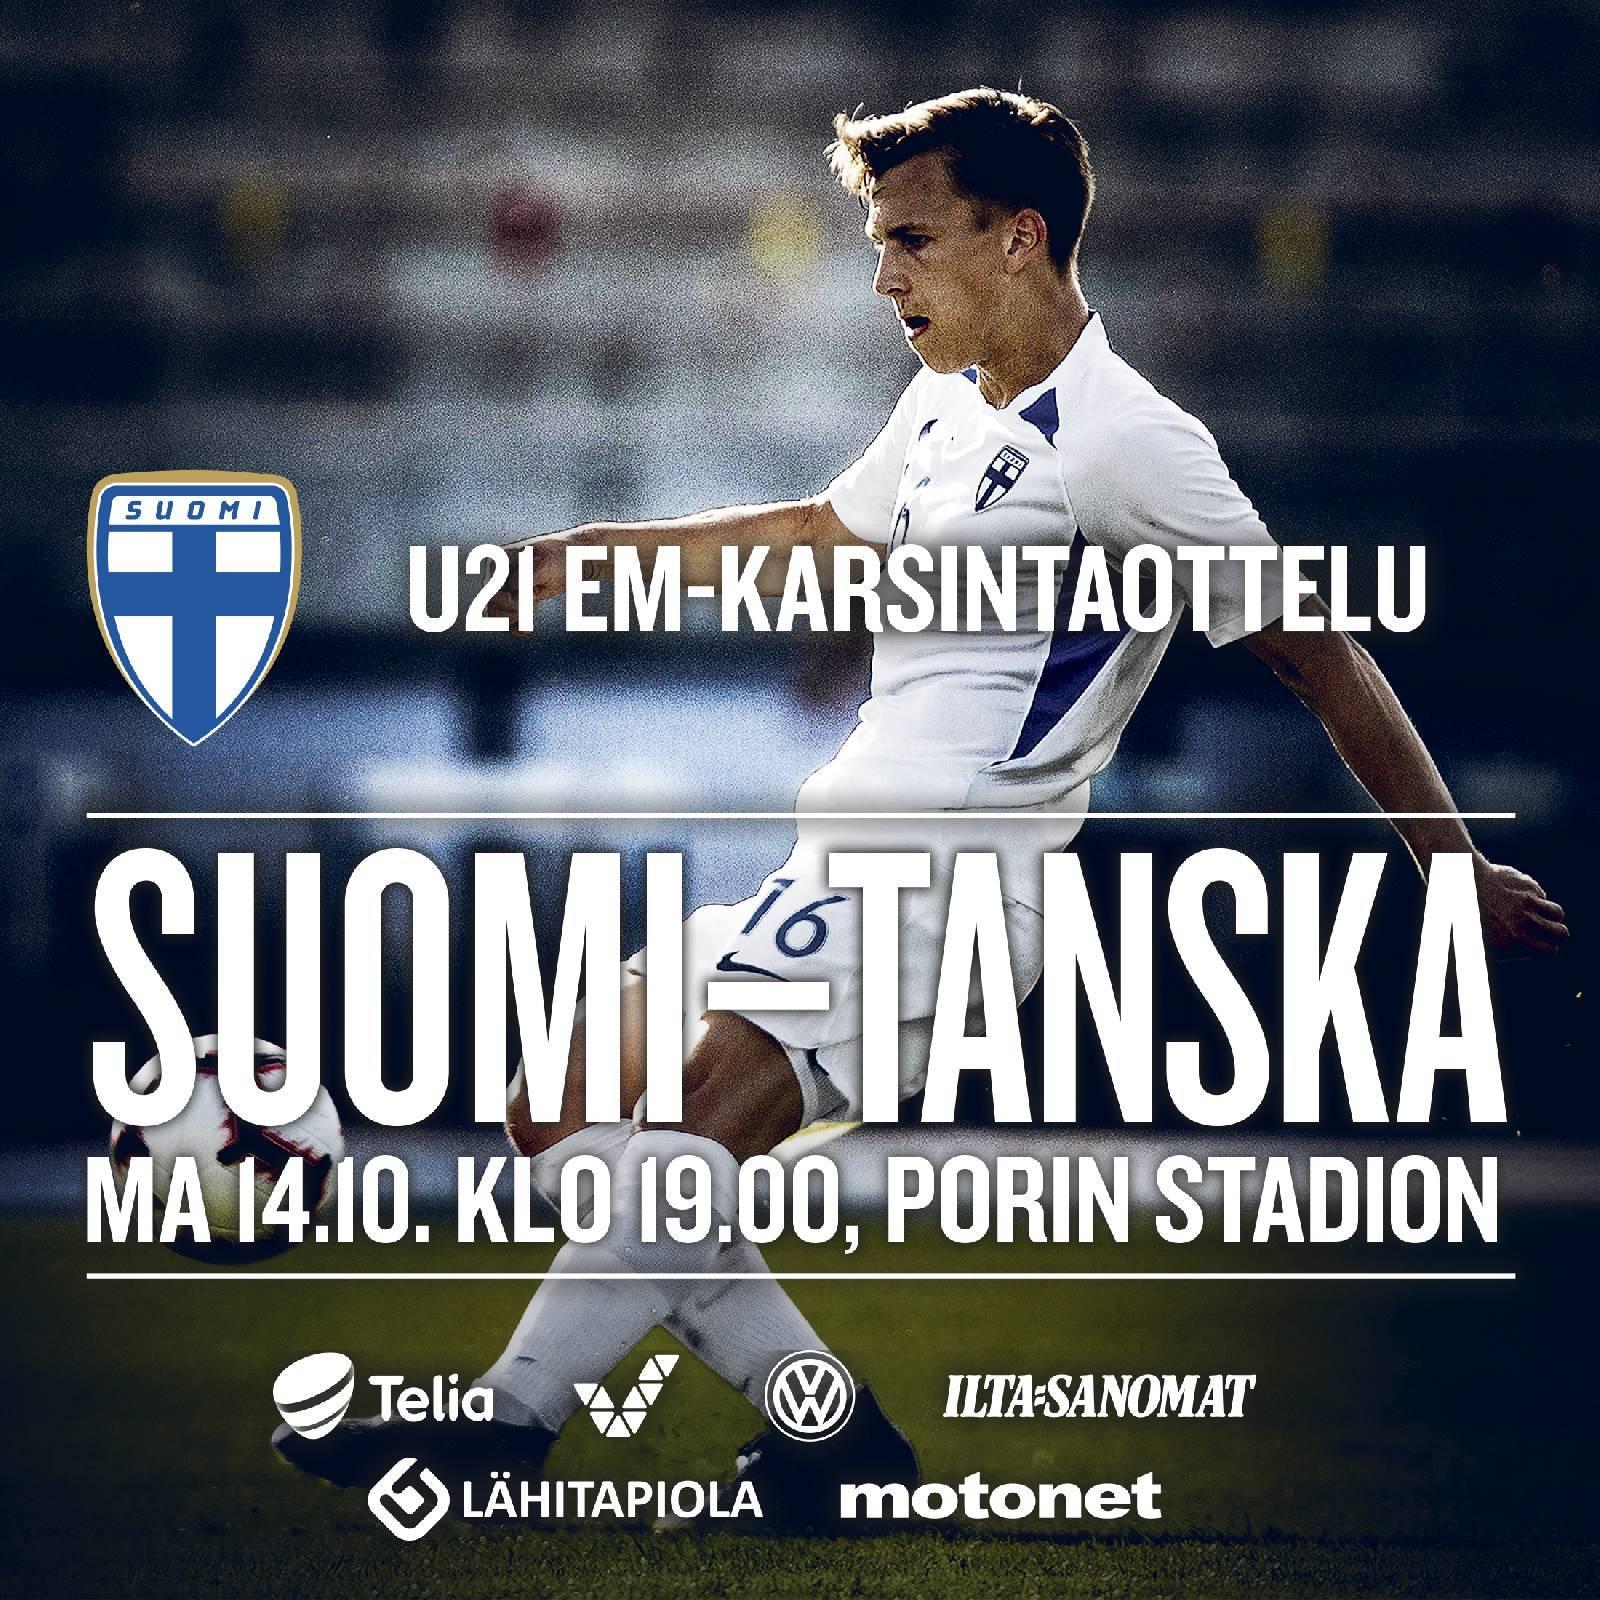 U21 EM-karsintaottelu Suomi – Tanska